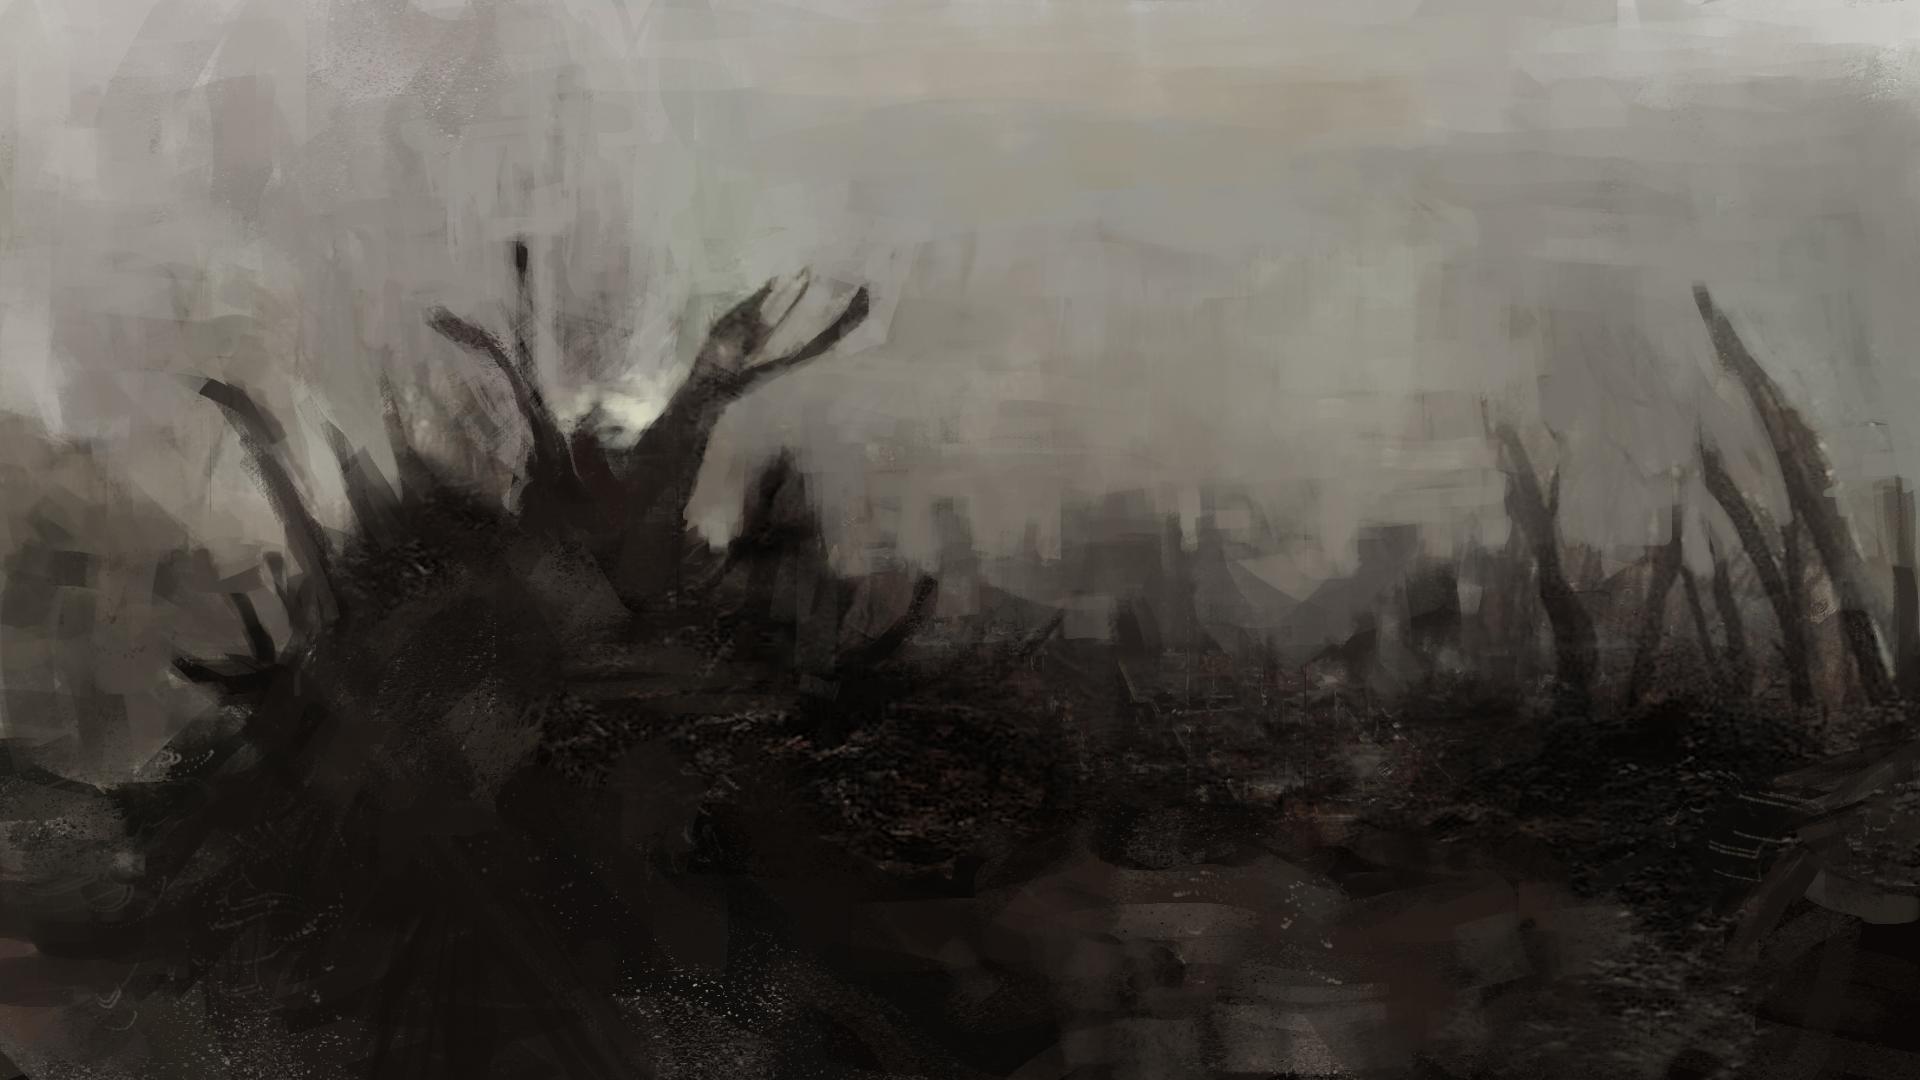 TW_LOC_ActIV_BurnedNight_020_JG